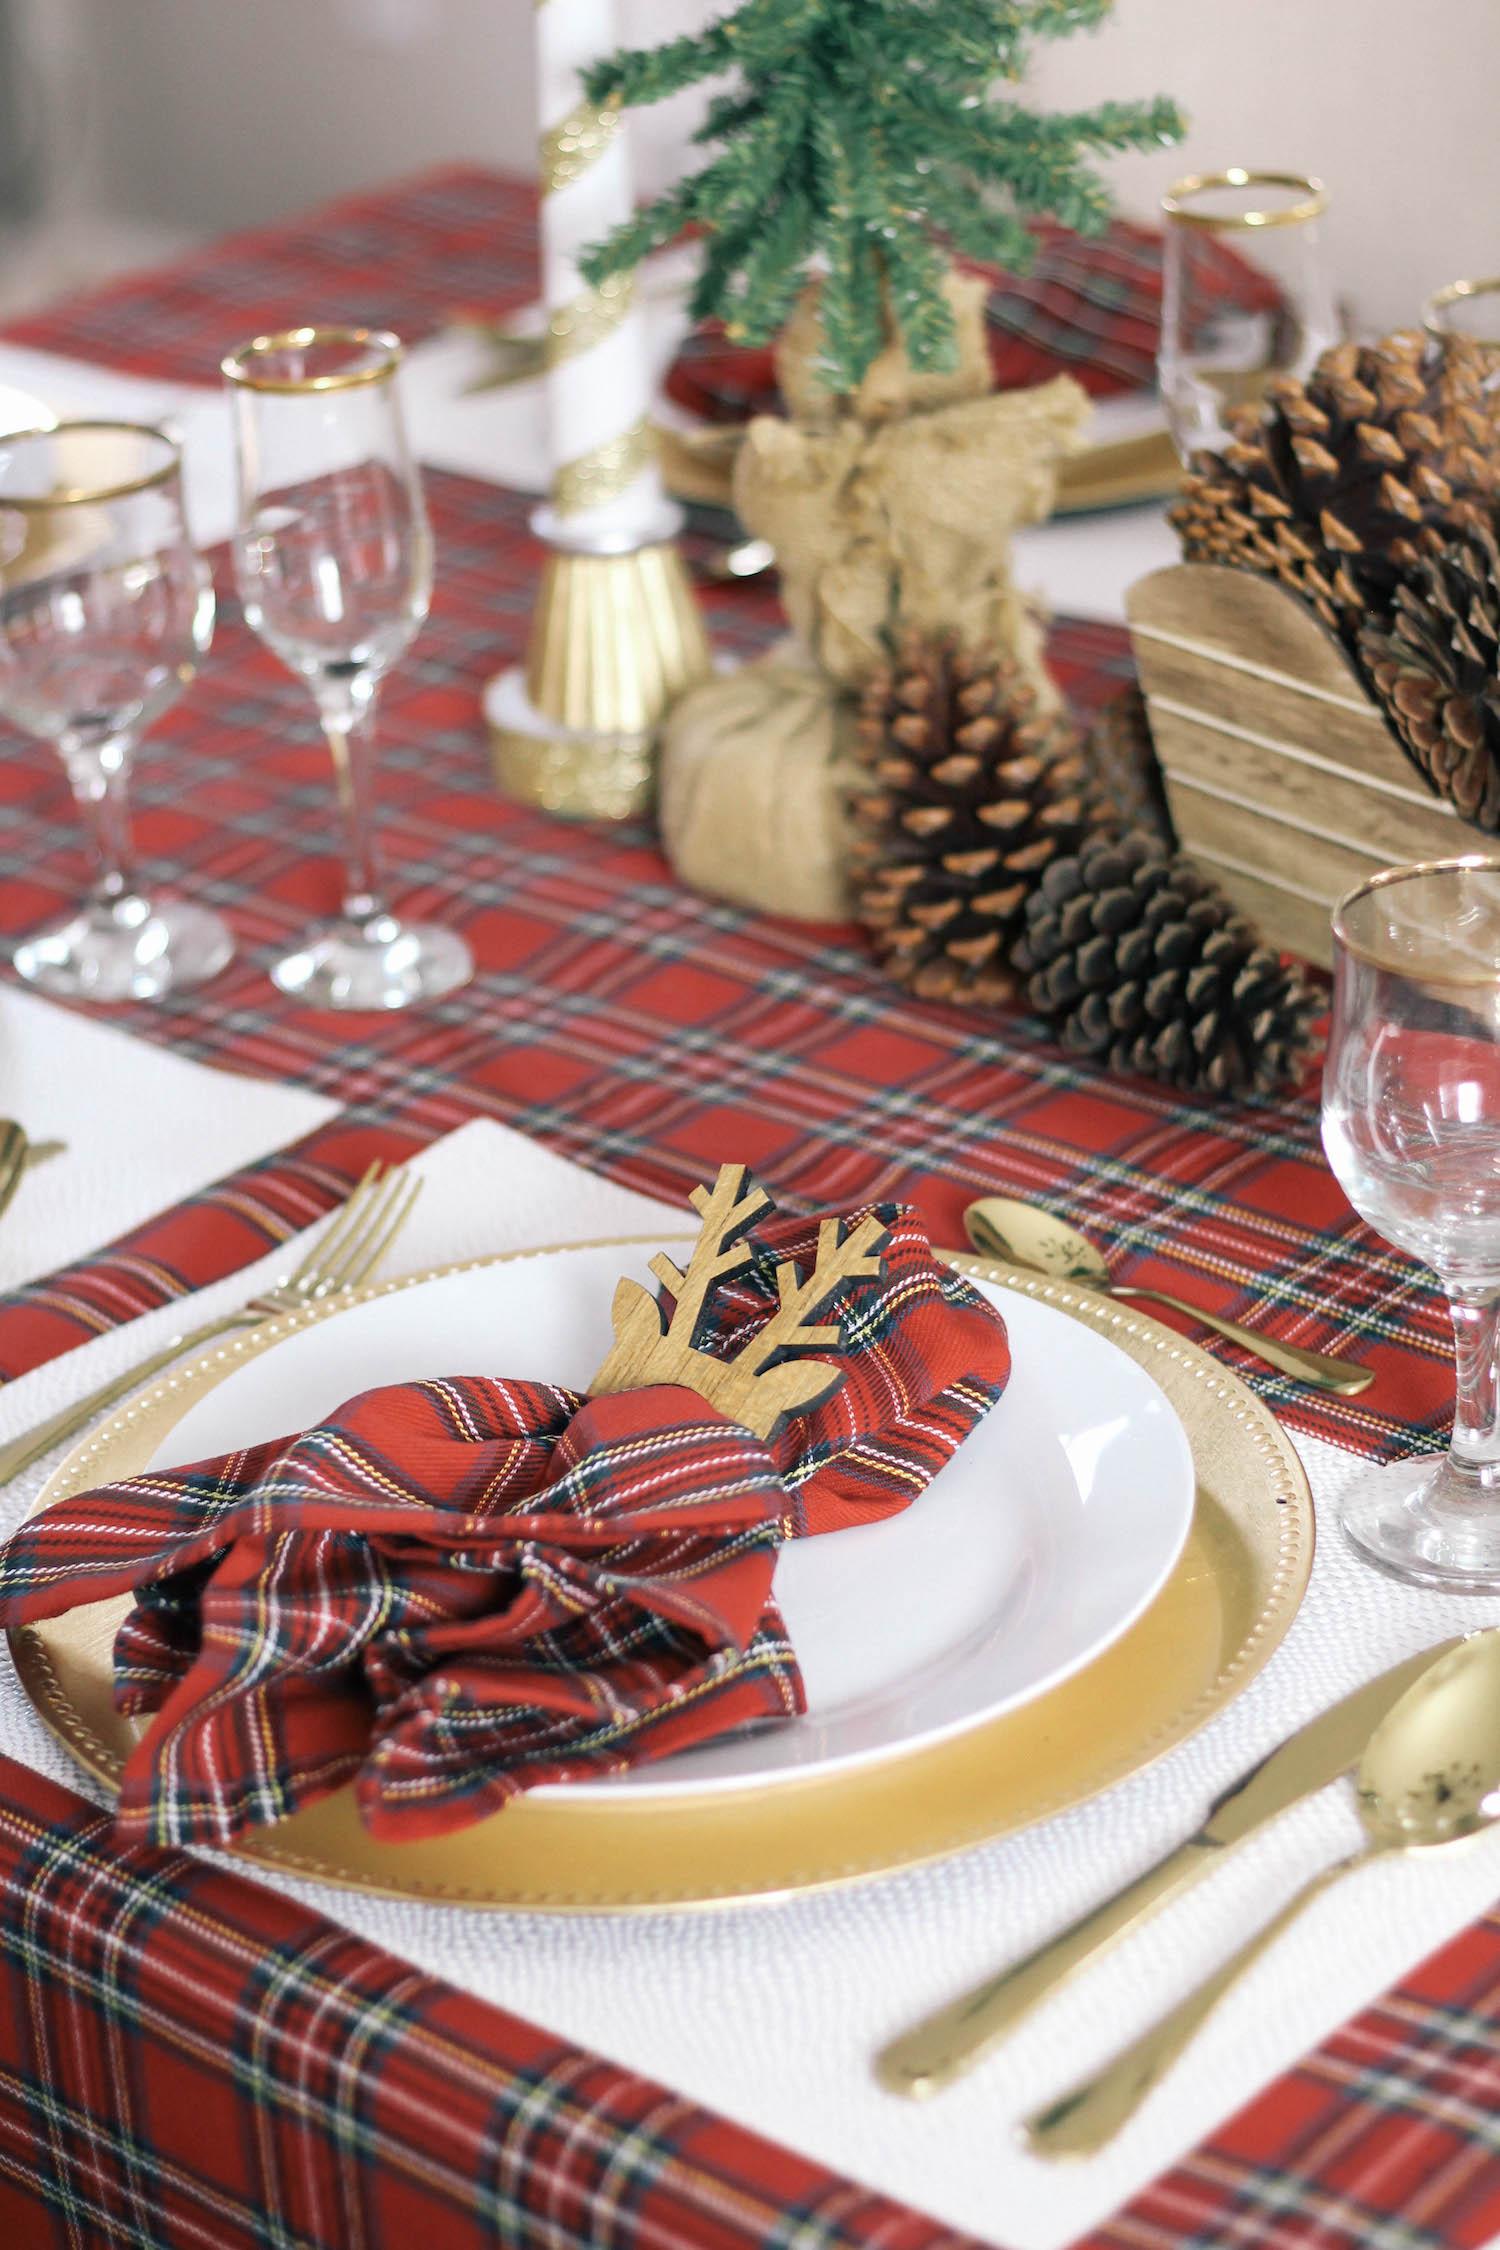 Christmas-Tablescape-Red-Plaid-Decor-12